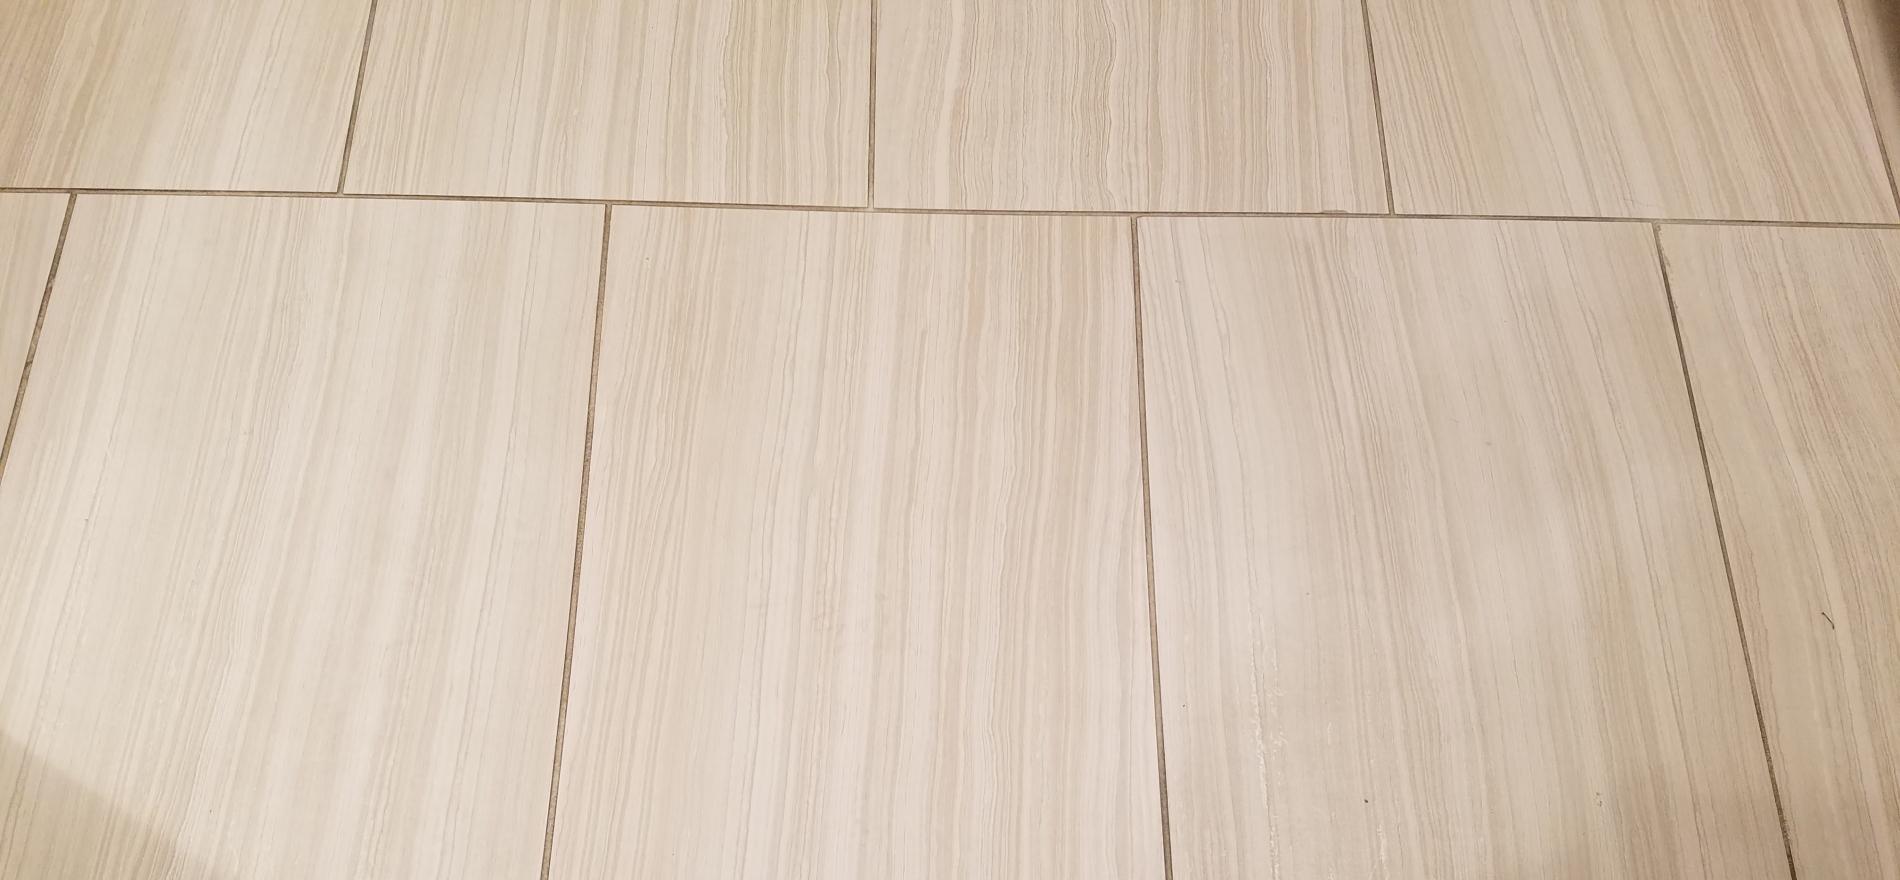 flooring6 Flooring Photos